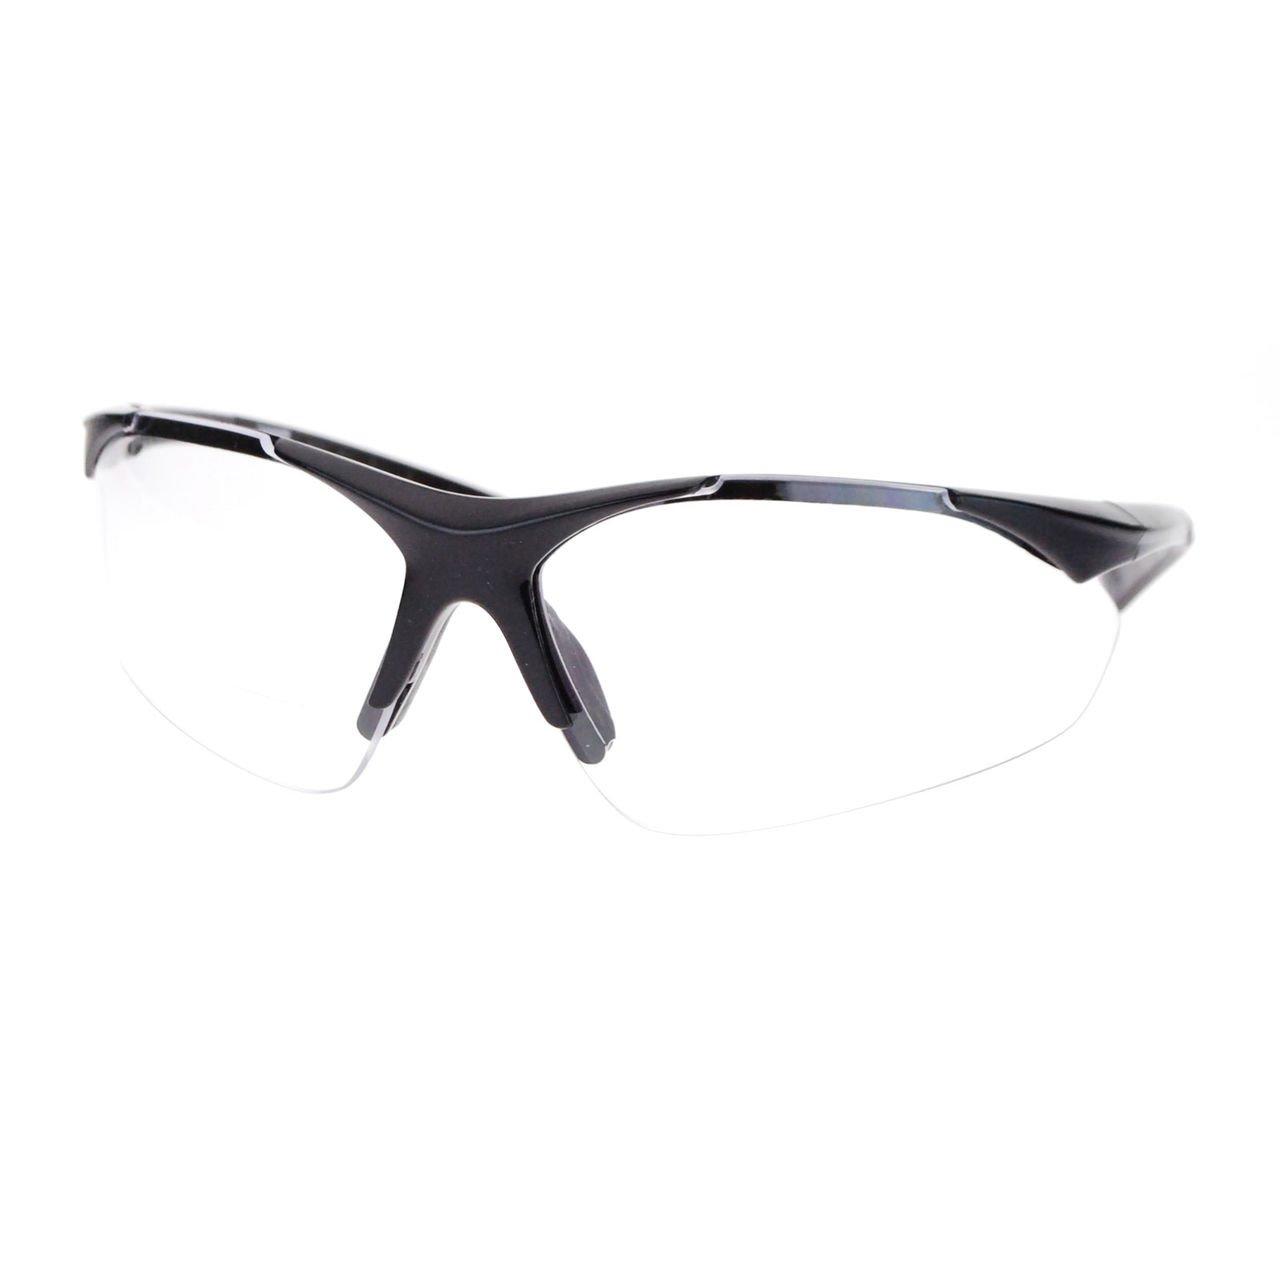 Mens Clear Lens Half Rim Sports Glasses with Bifocal Reading Lens